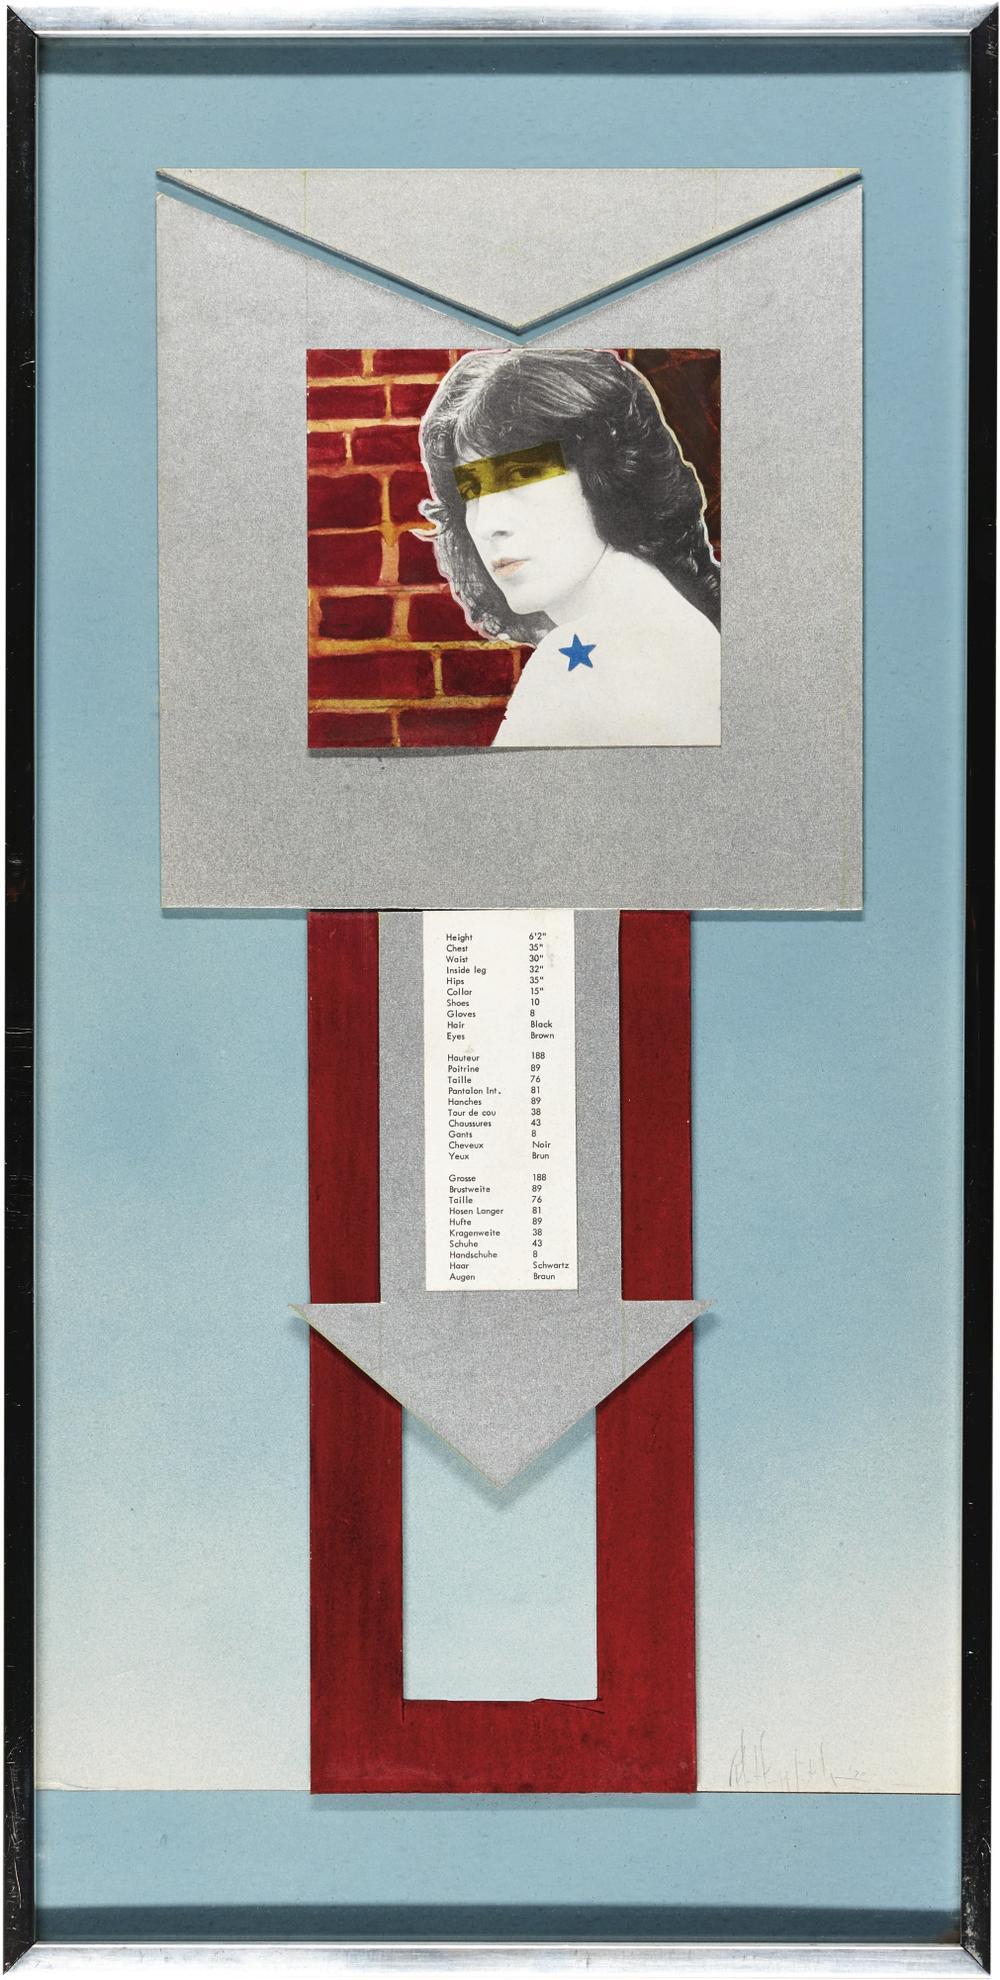 Robert Mapplethorpe-Untitled (David Against Brick Wall)-1970